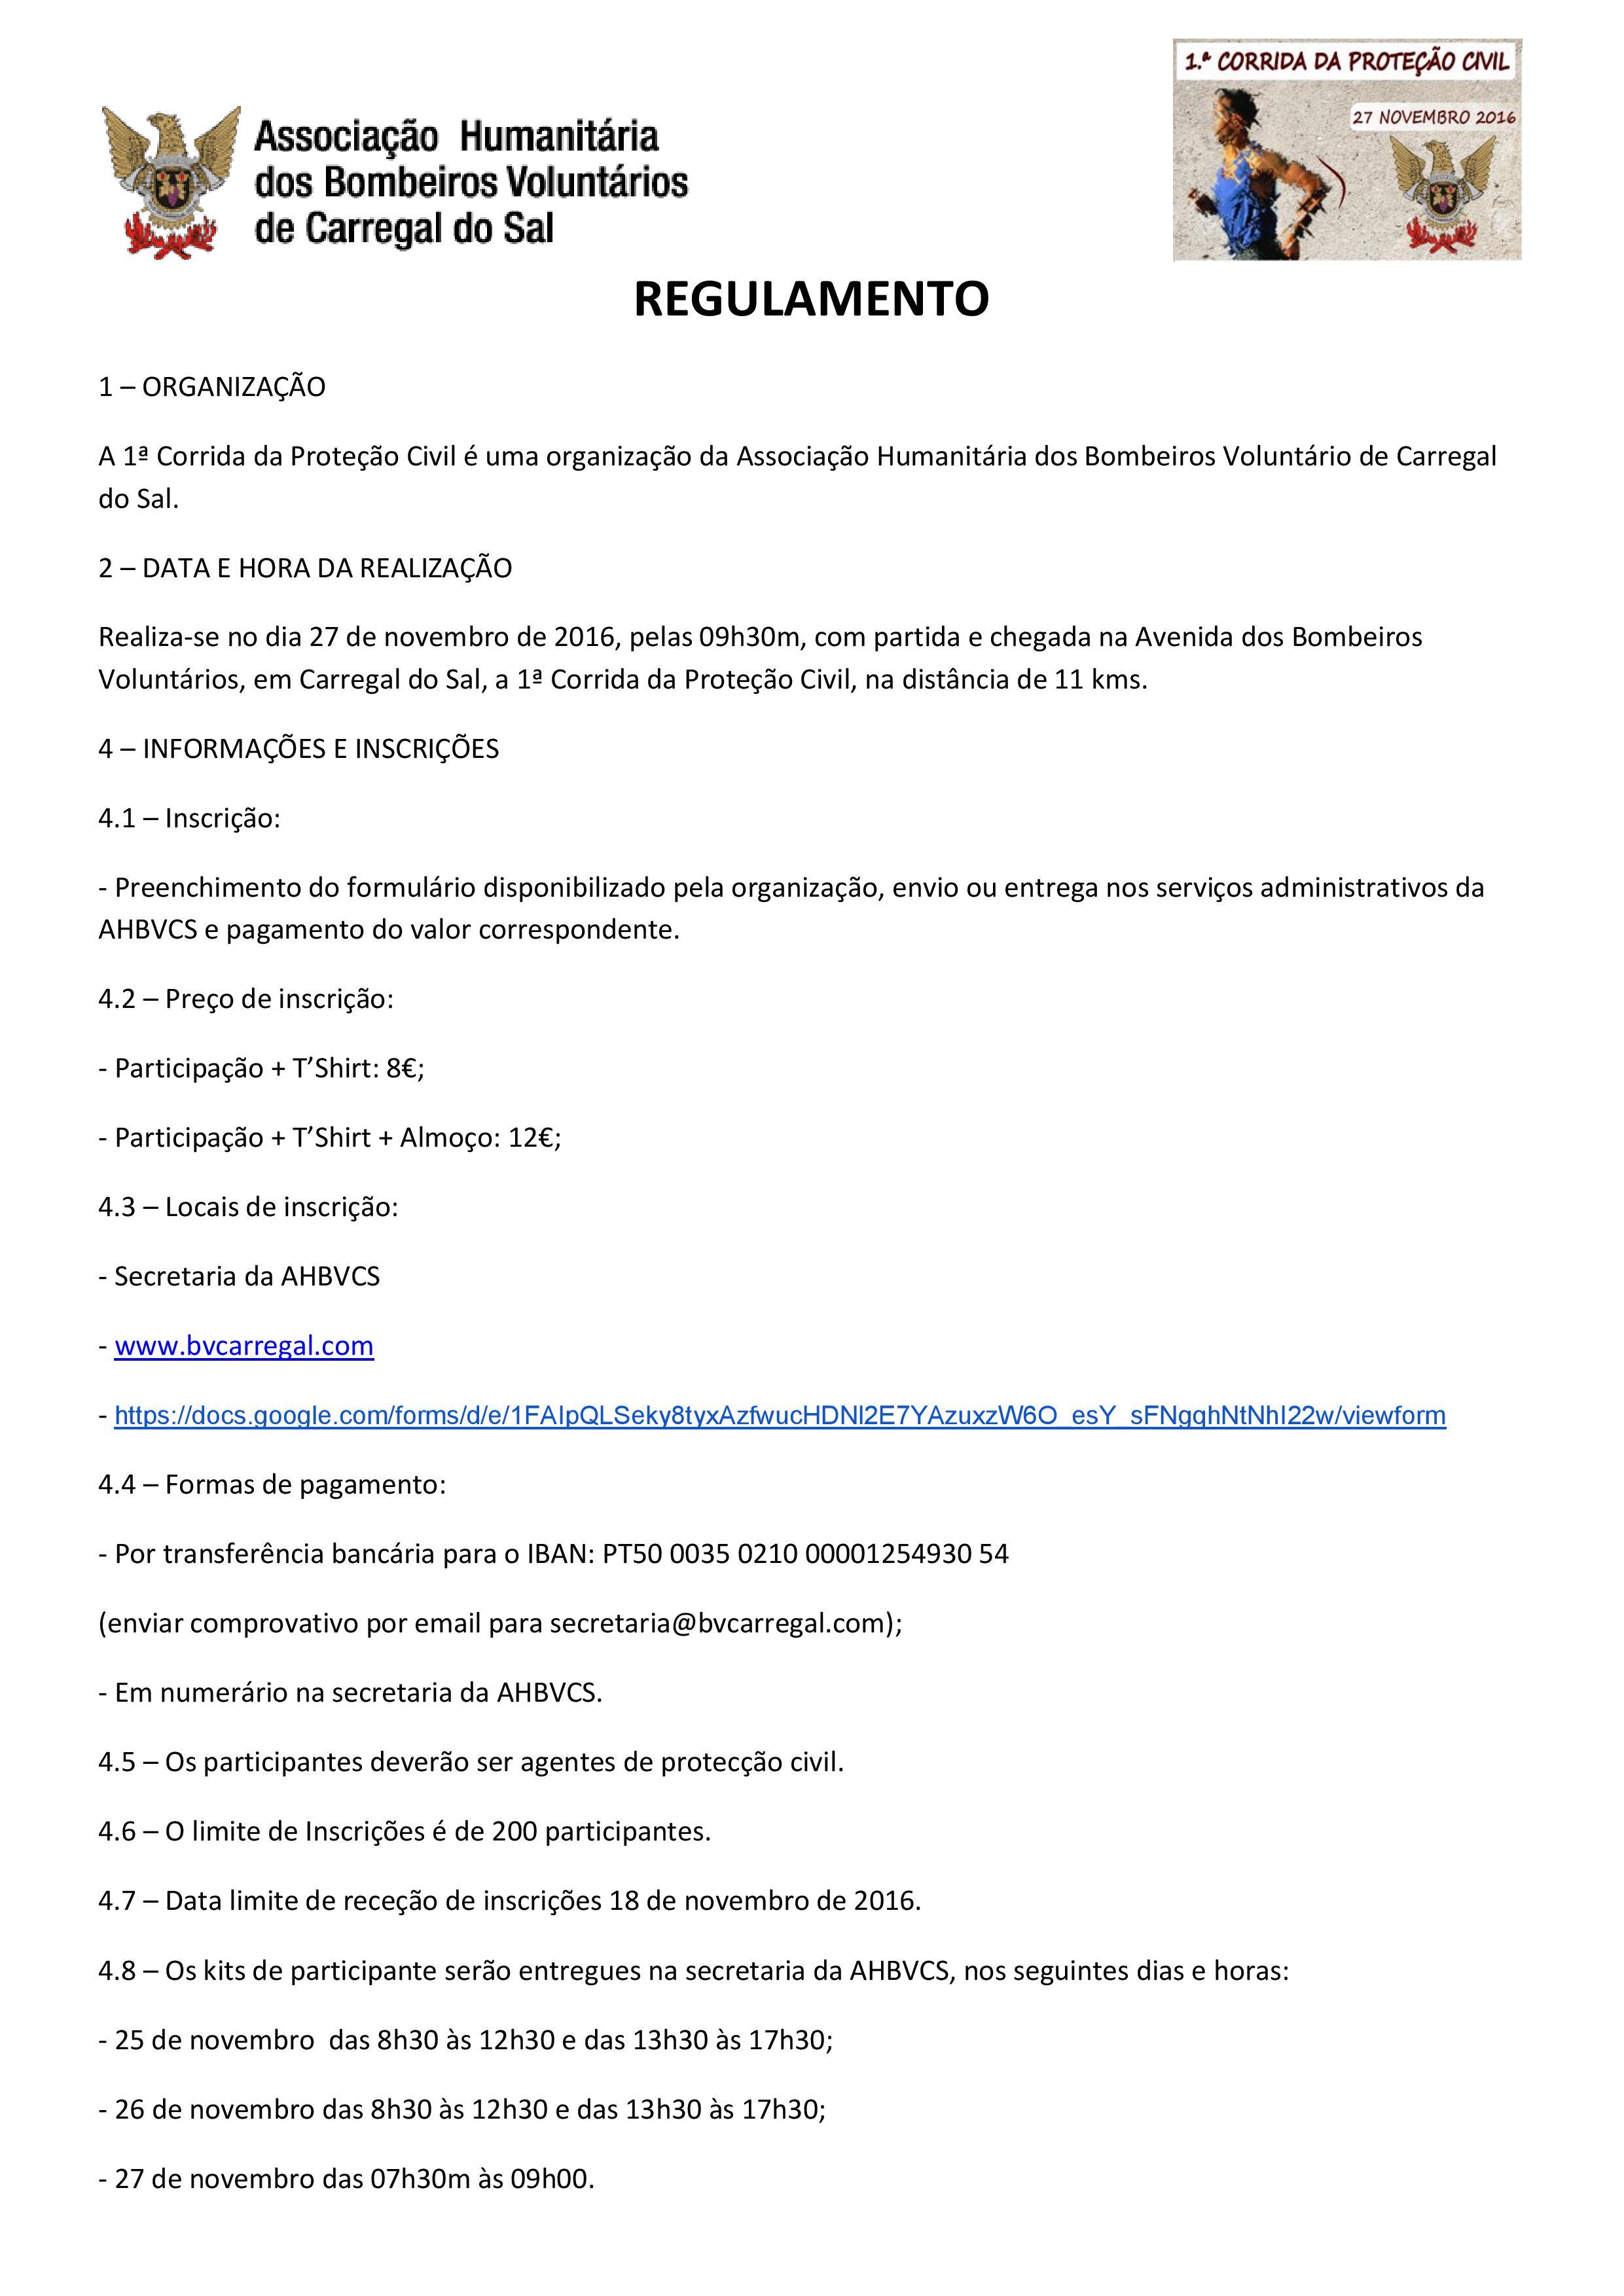 regulamento-1a-corrida-da-protecao-civil_bvcs_final-page-001